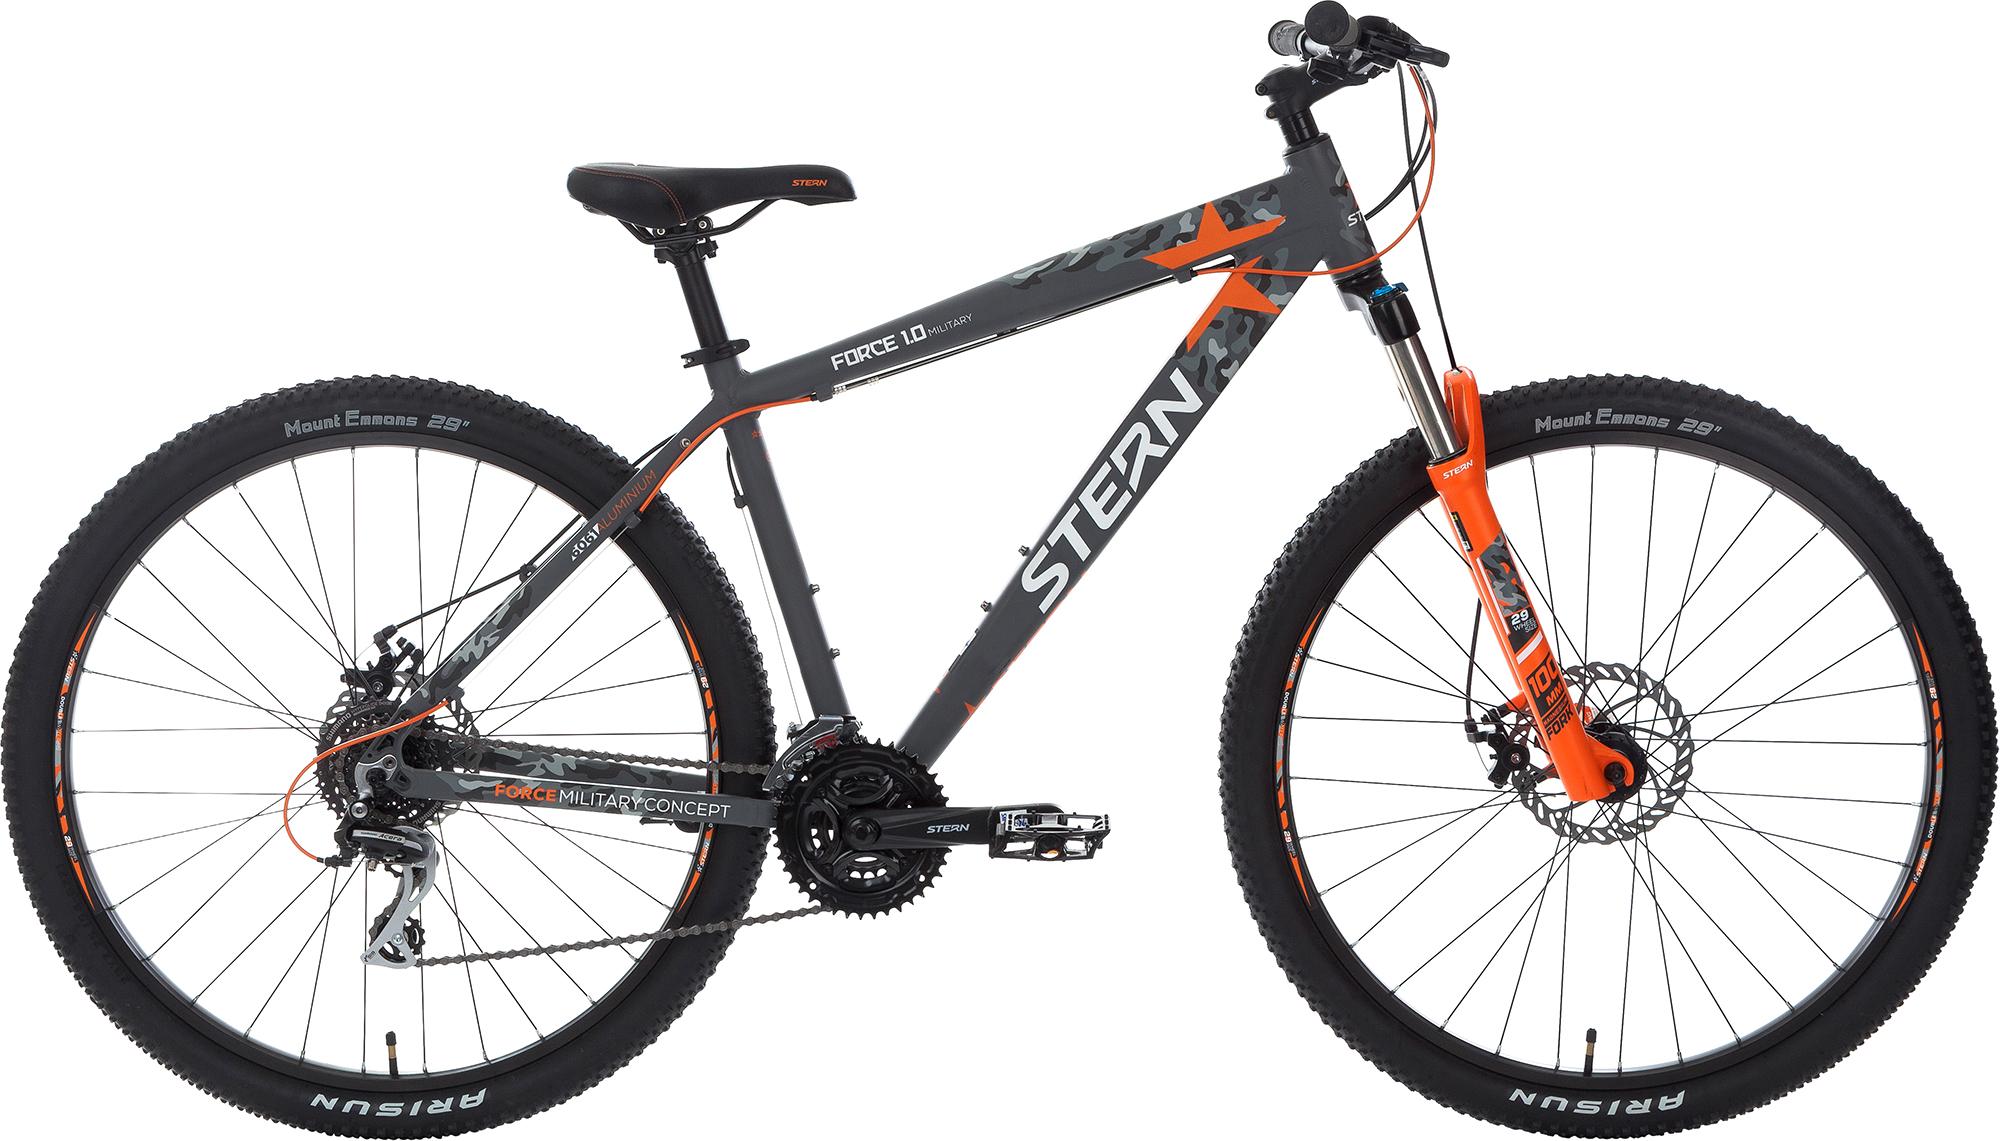 Stern Велосипед горный Stern Force 1.0 alt 29 цена